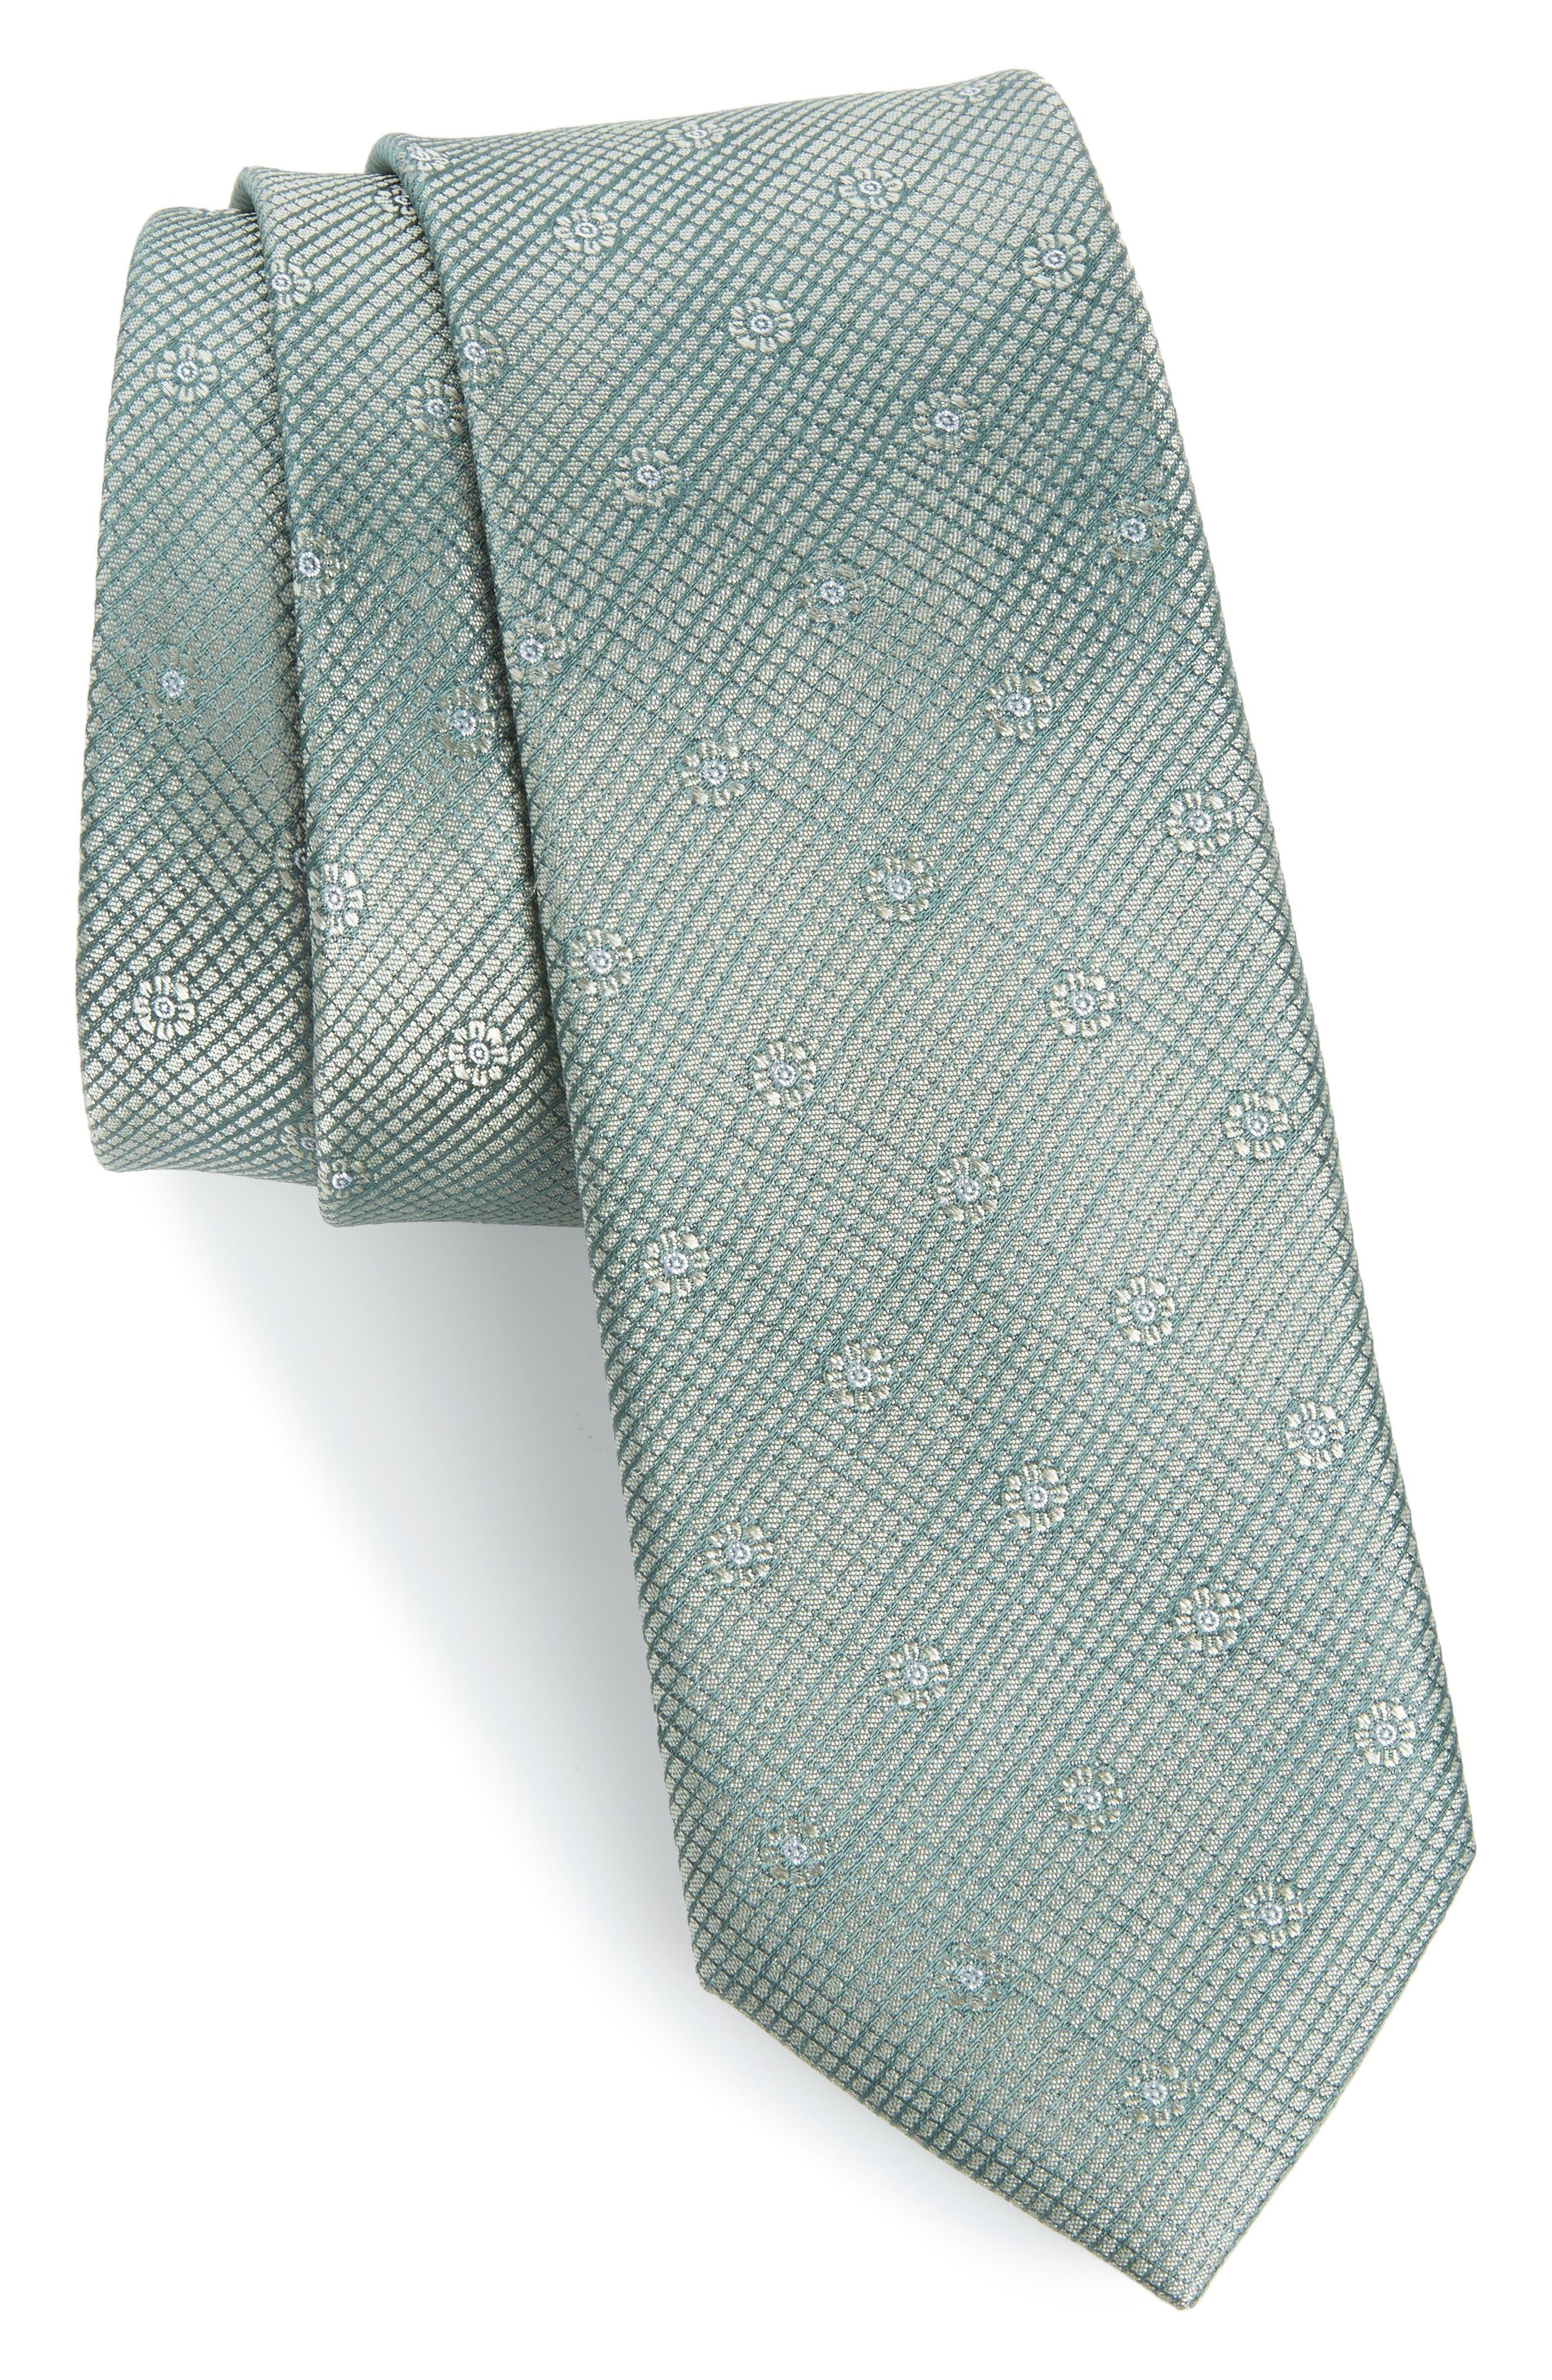 Fleur Medallion Silk Skinny Tie,                             Main thumbnail 1, color,                             300